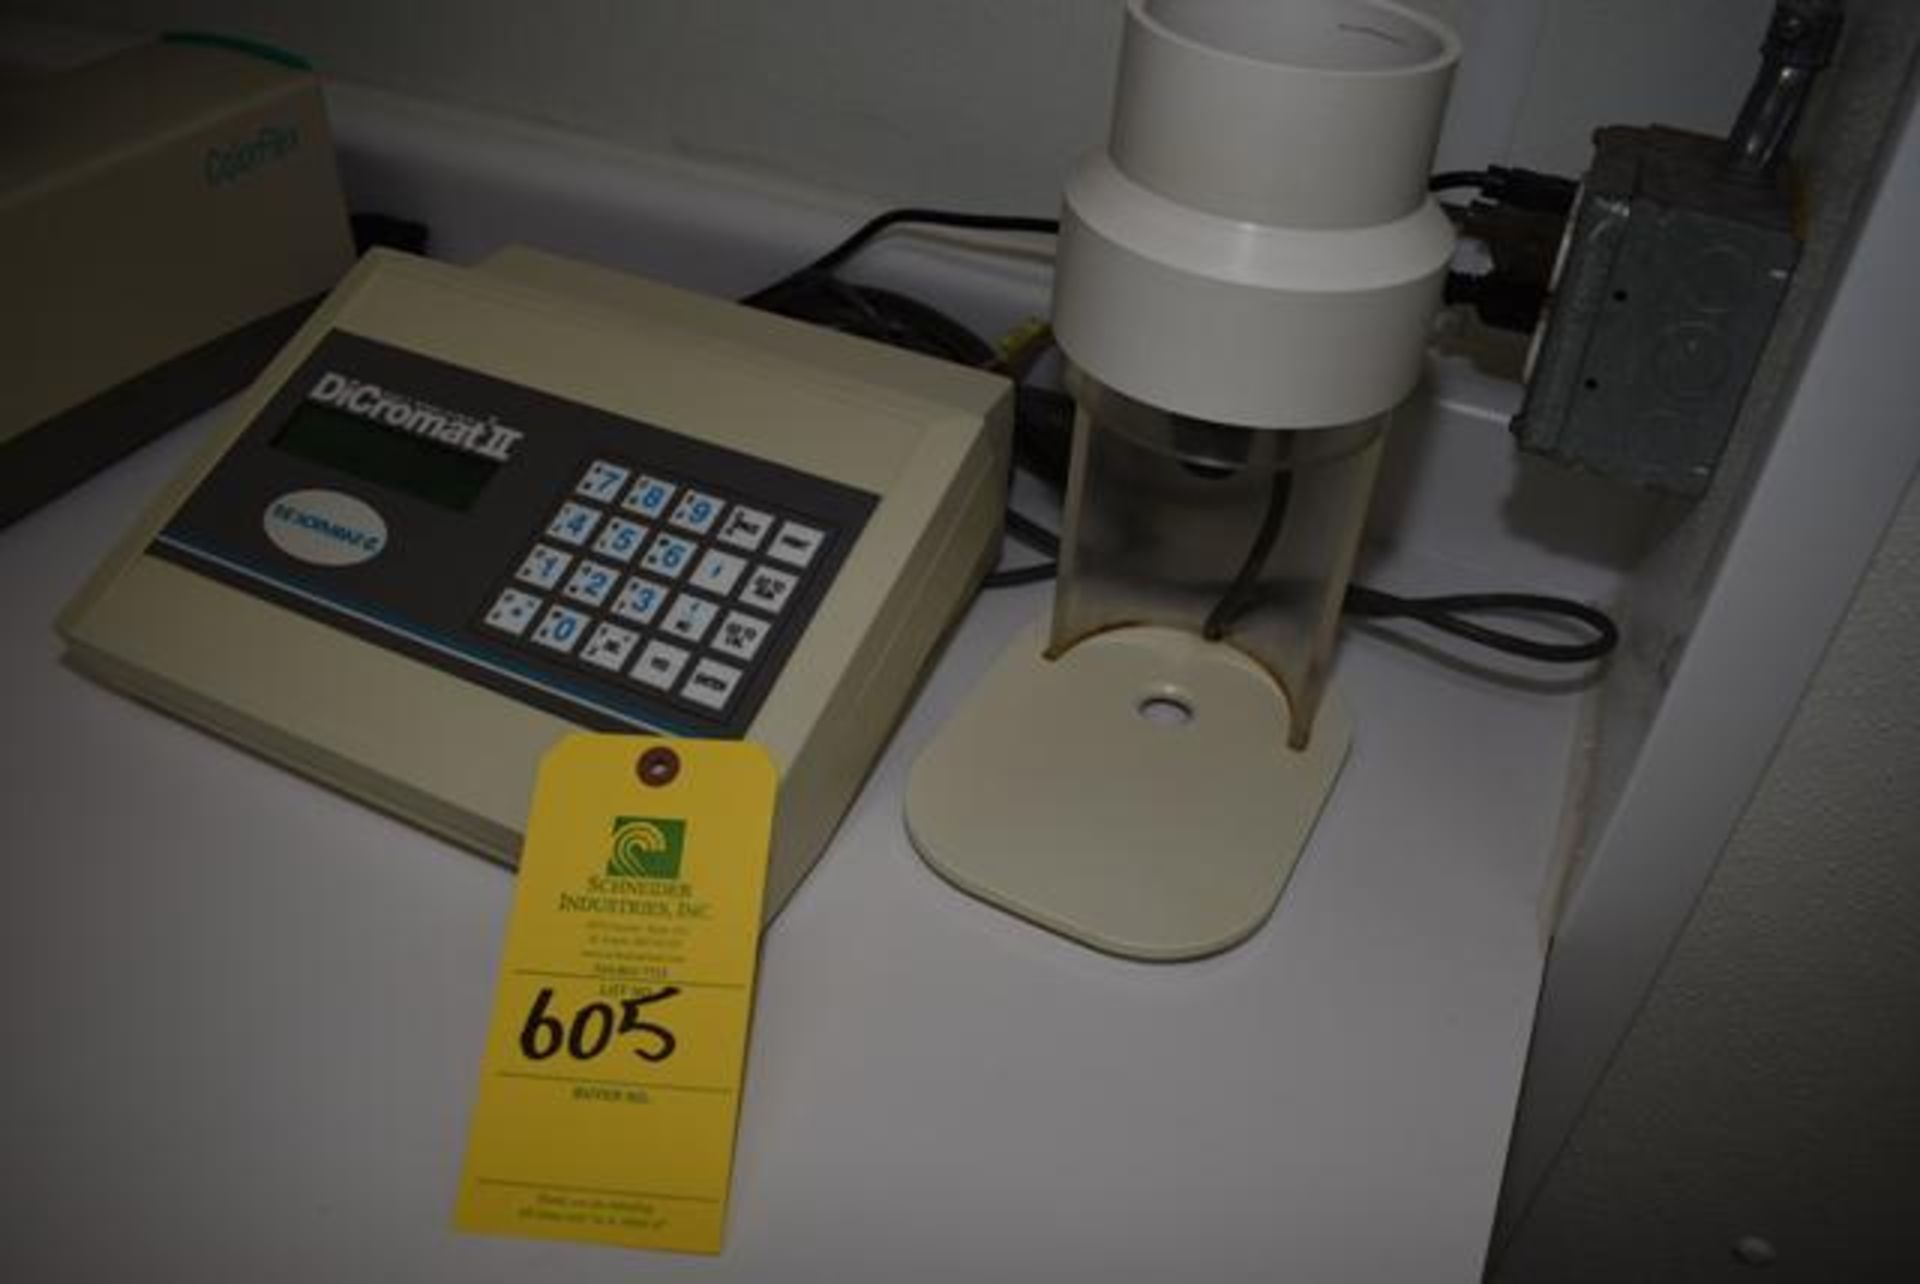 Lot 605 - Dicromat 2 Salt Analyzer, Loading Fee: $10